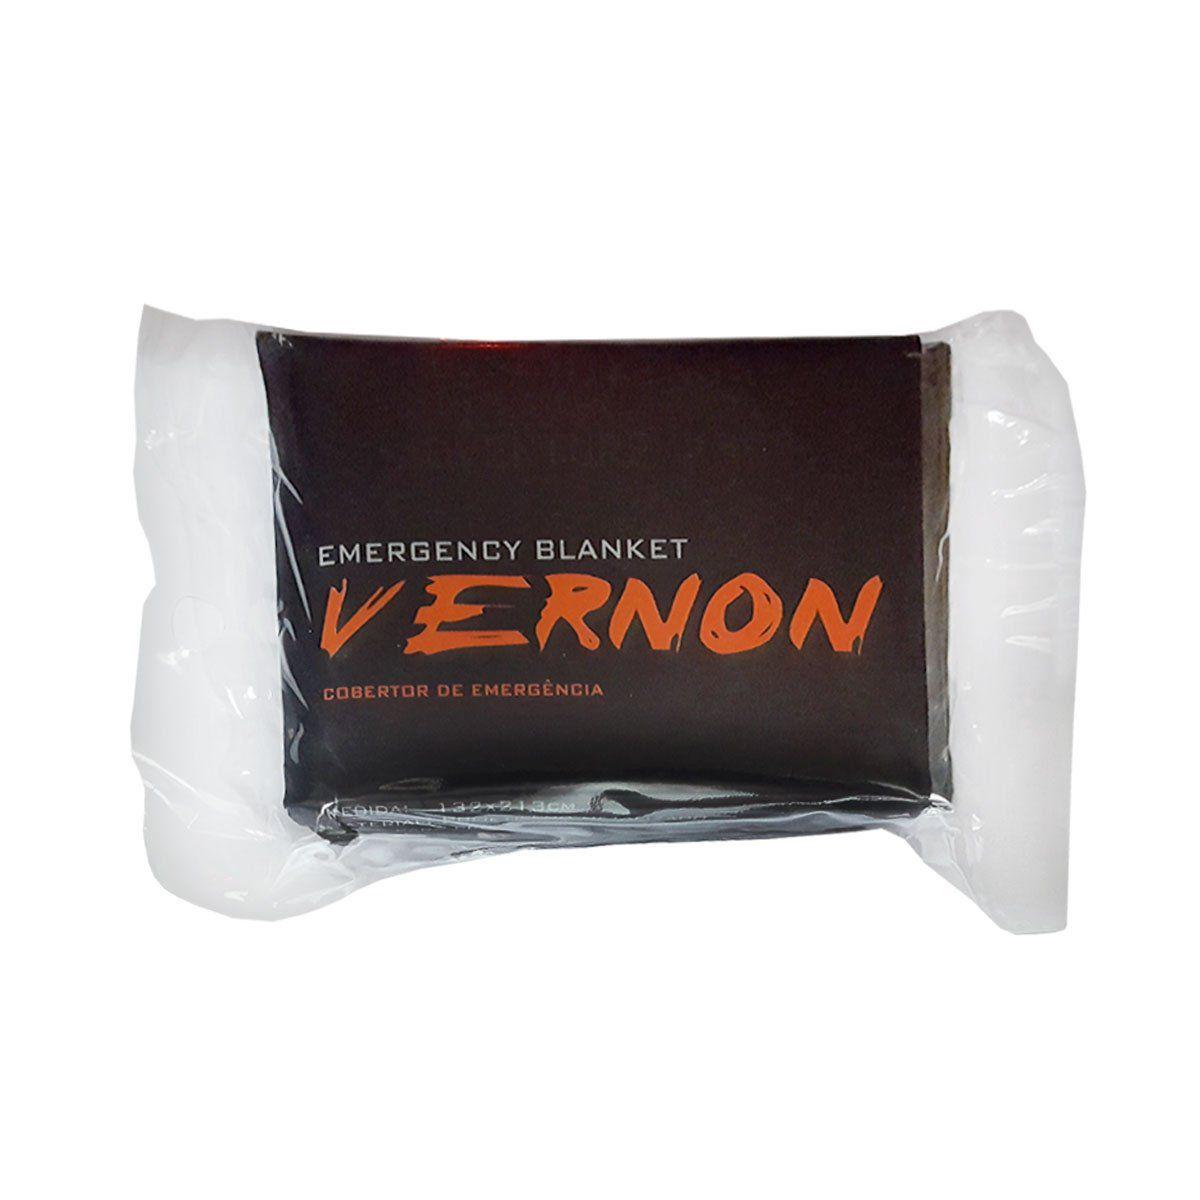 Cobertor de Emergência Vernon Azteq